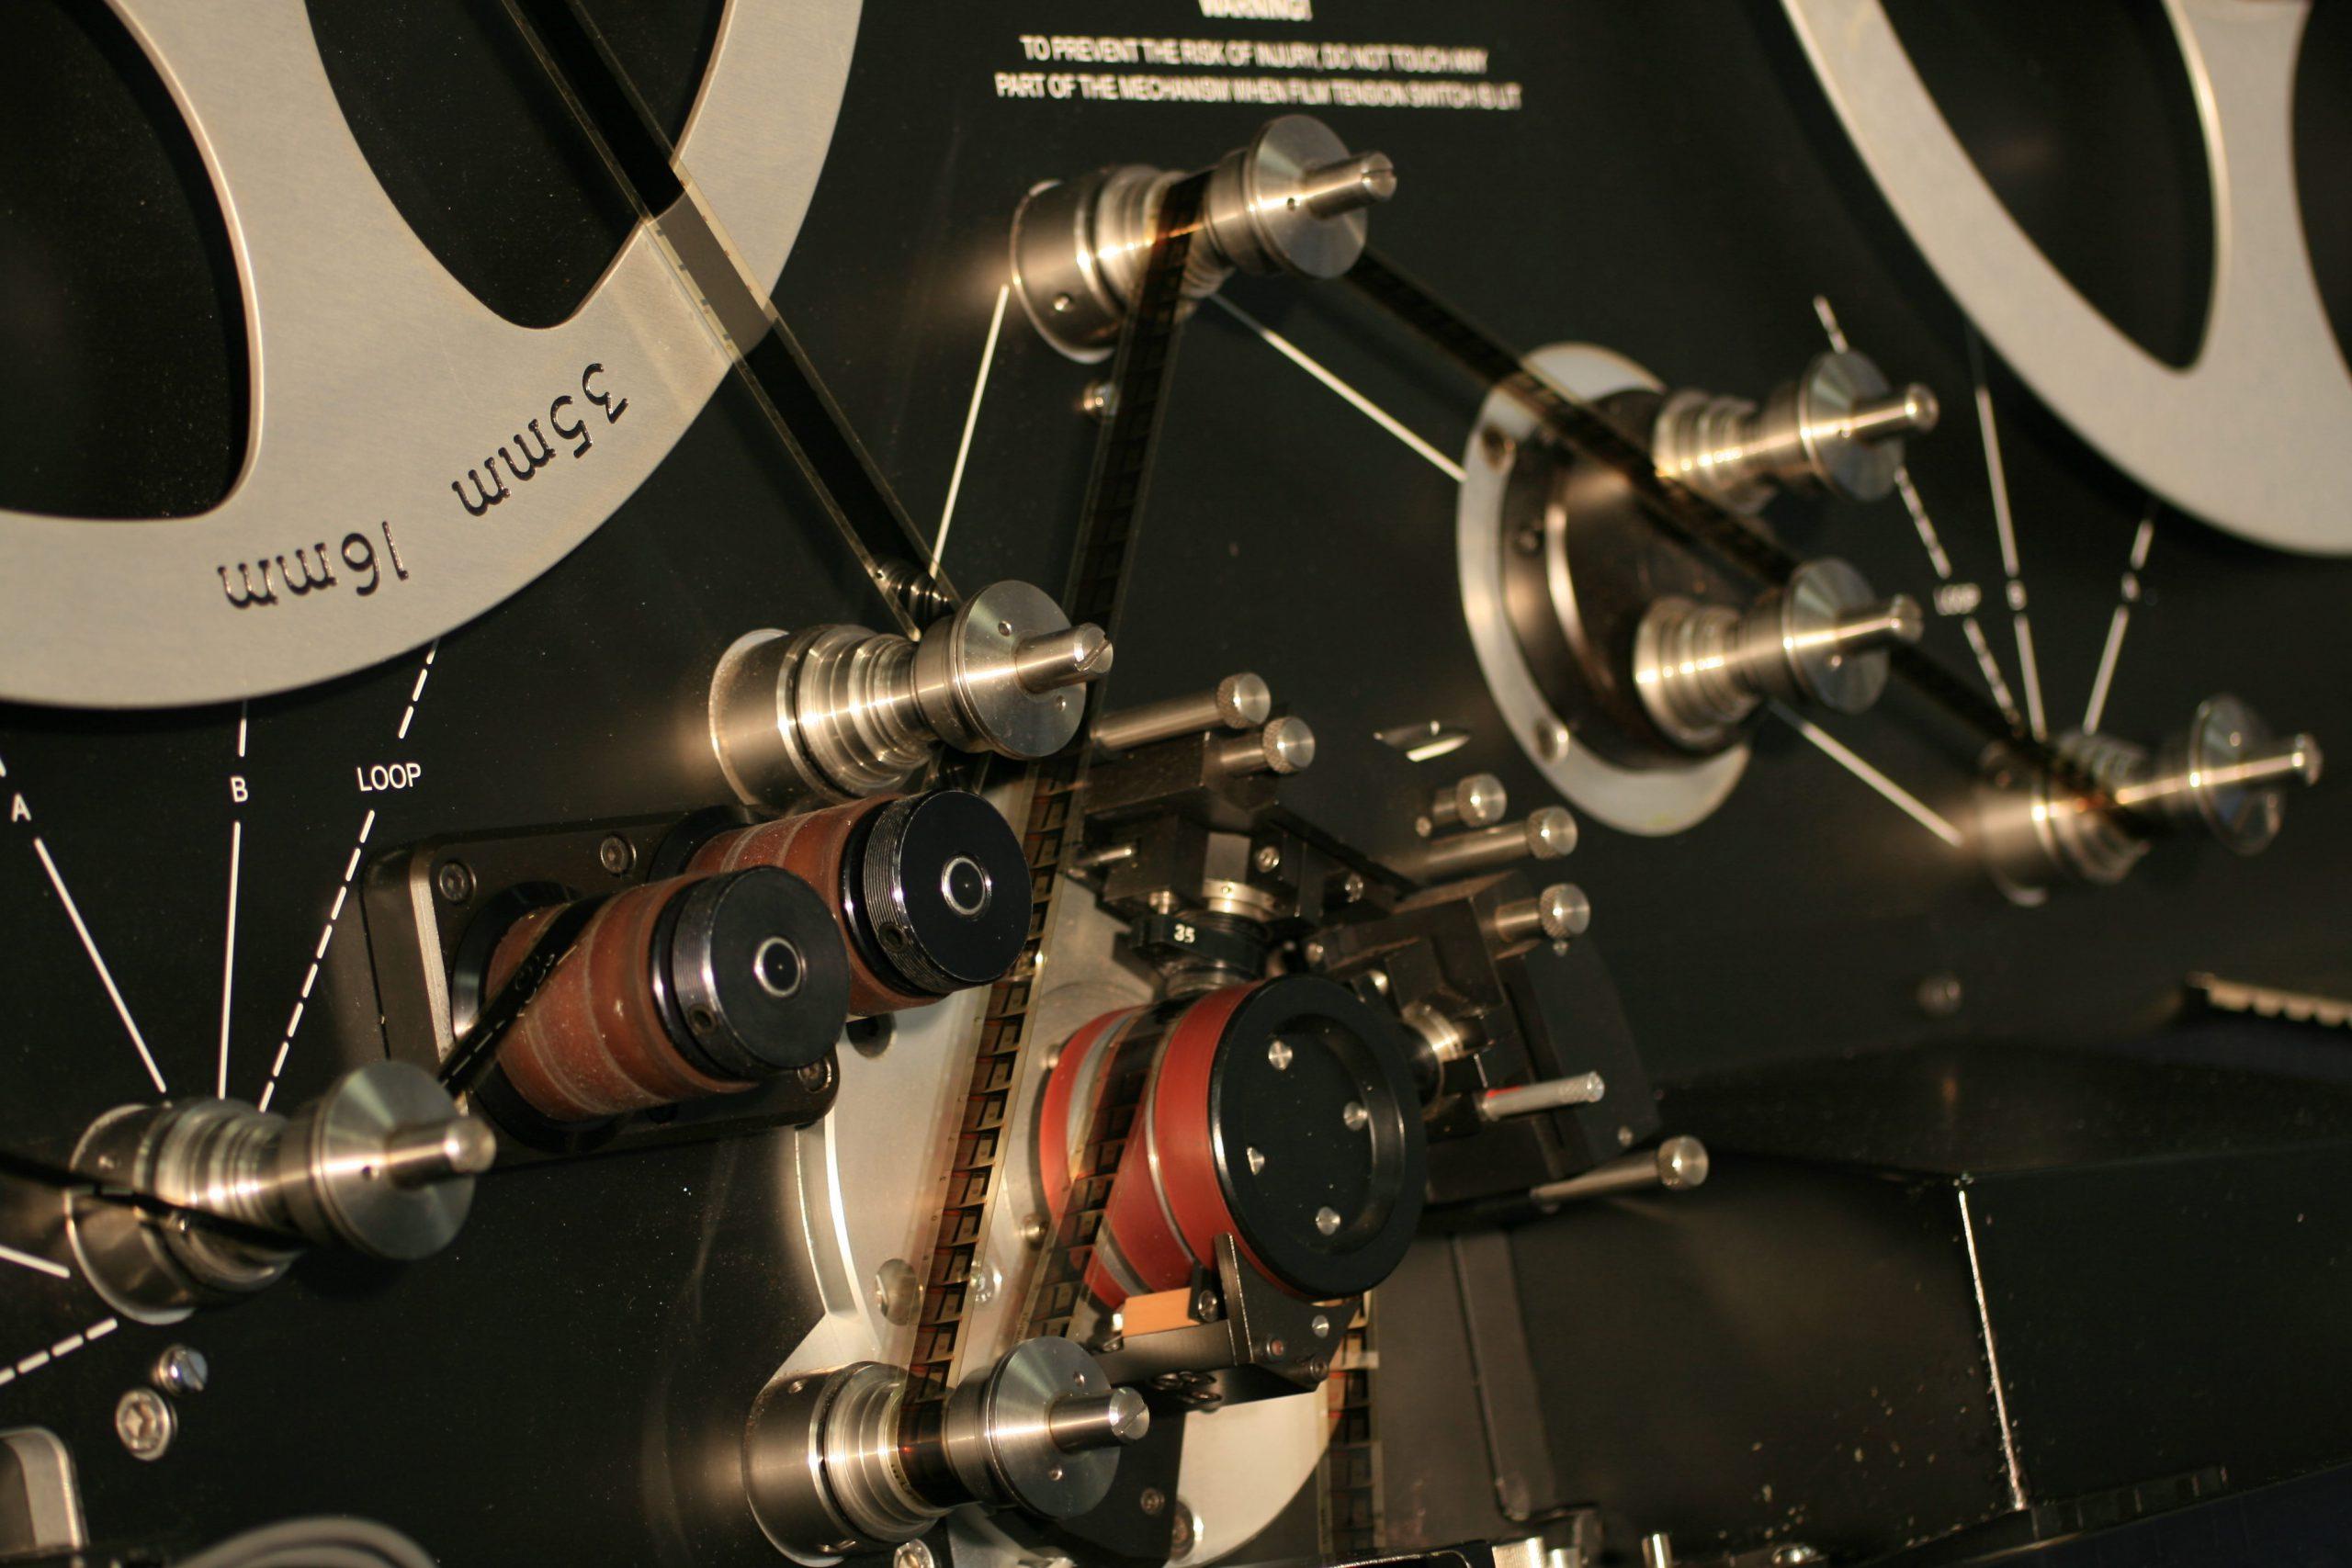 film 16 / 35 mm - film 16 35 scaled - Film 16 / 35 mm